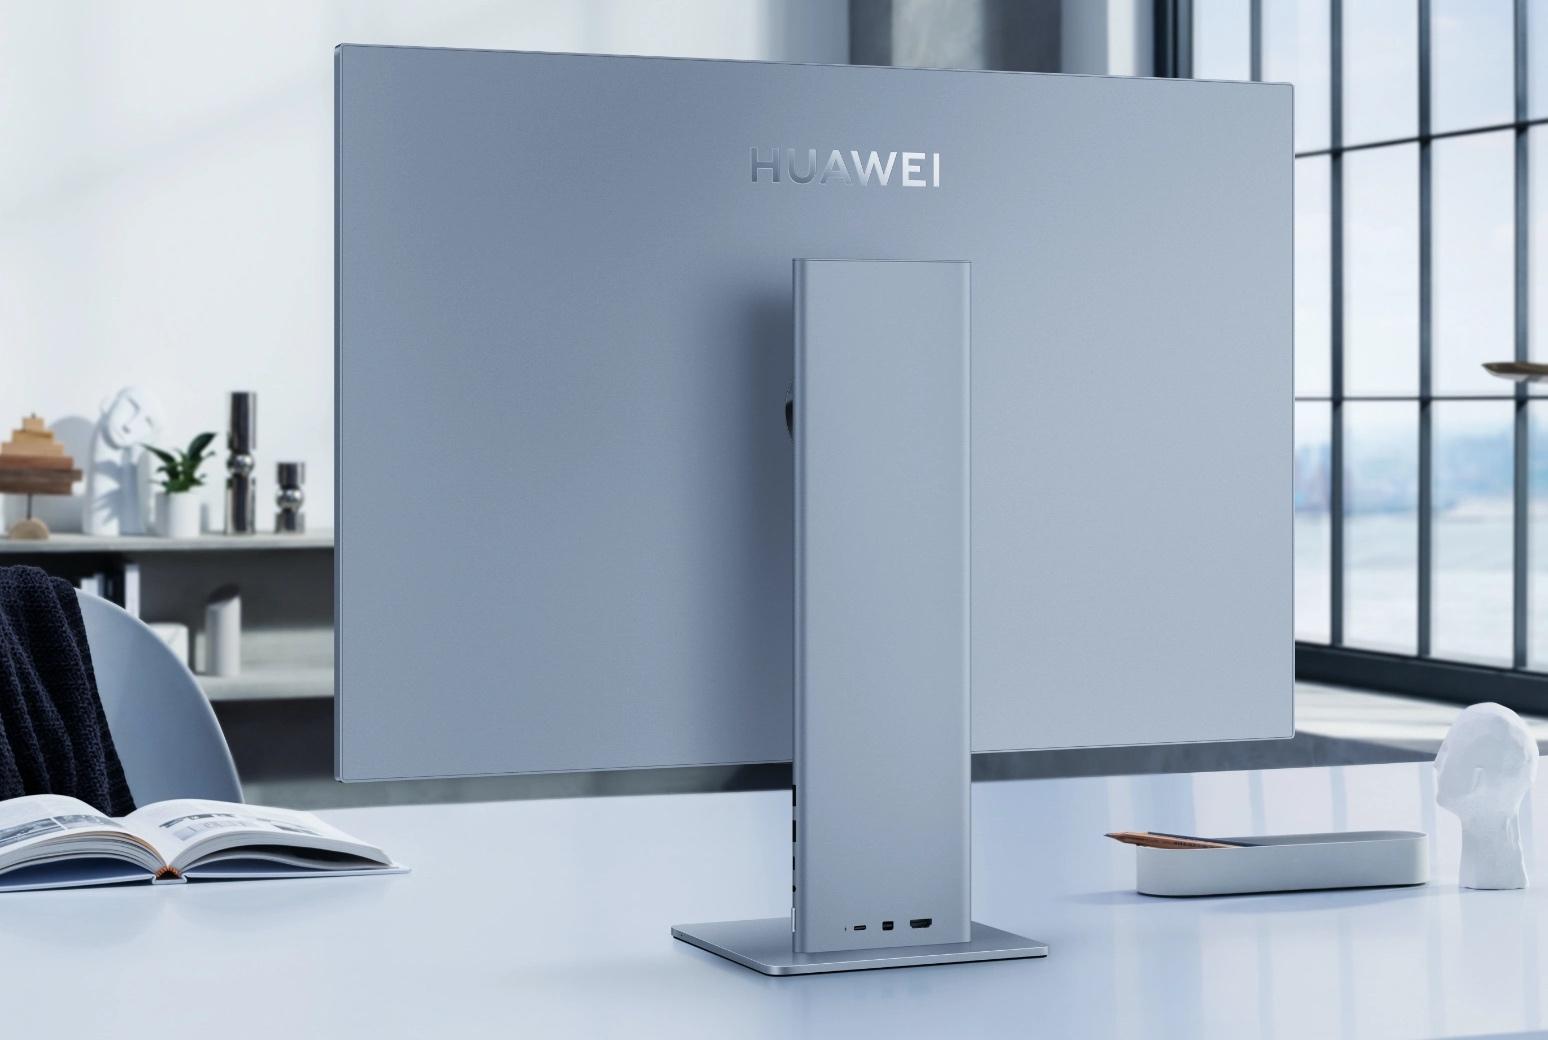 (Image source: Huawei)